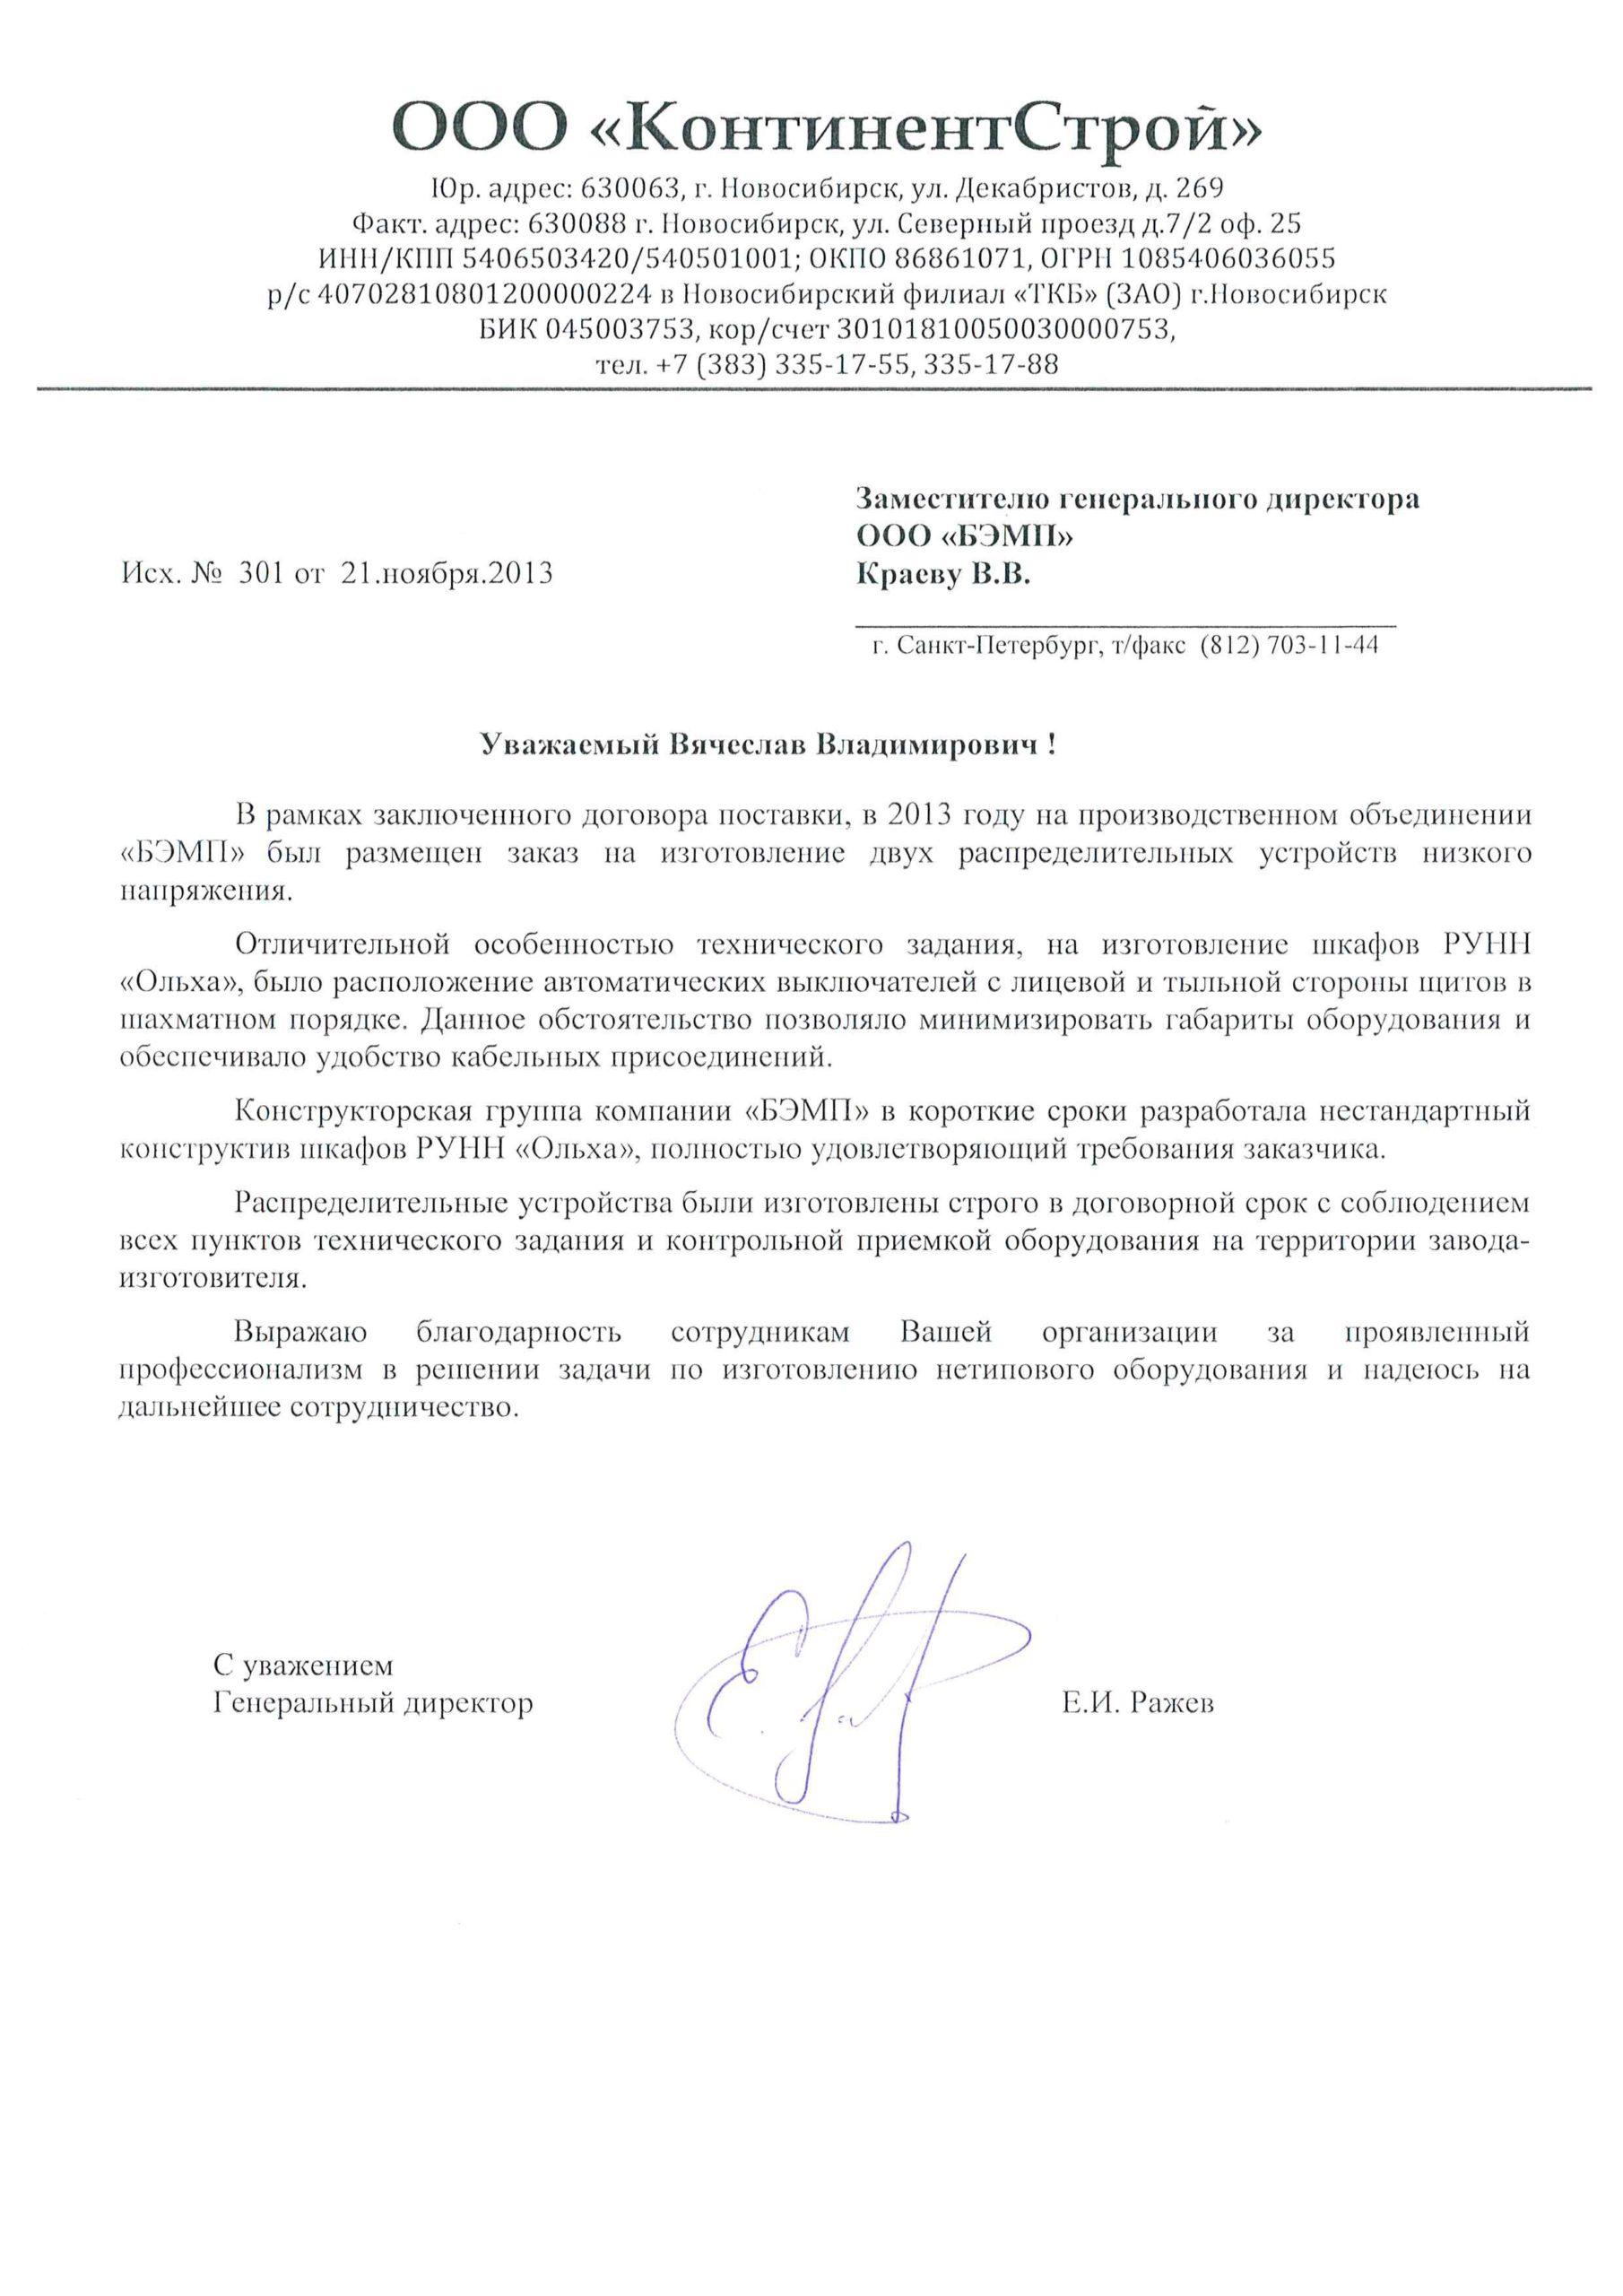 КонтинентСтрой-144_file